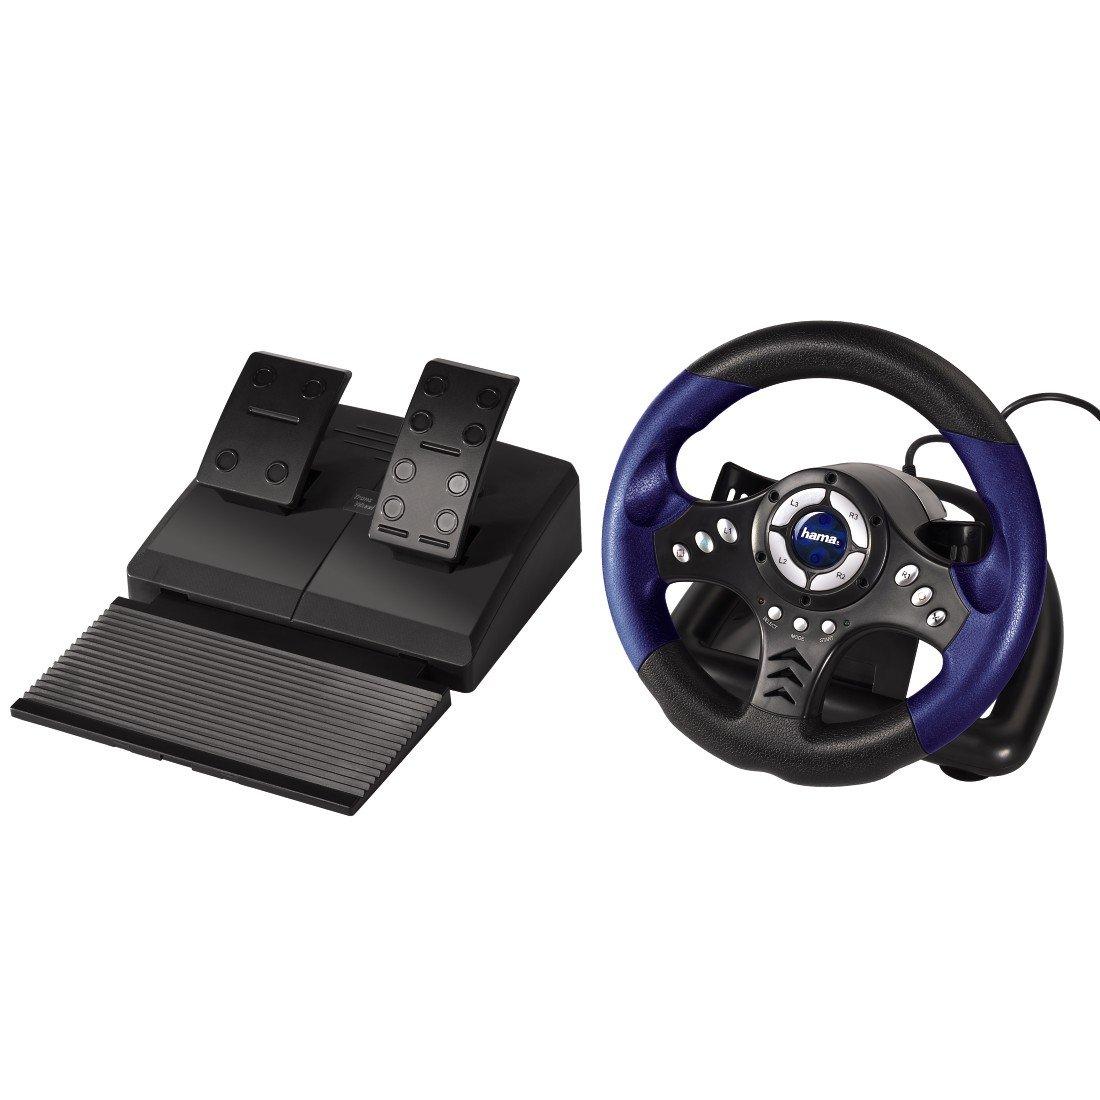 HAMA PC RACING WHEEL THUNDER V18 USB DRIVER